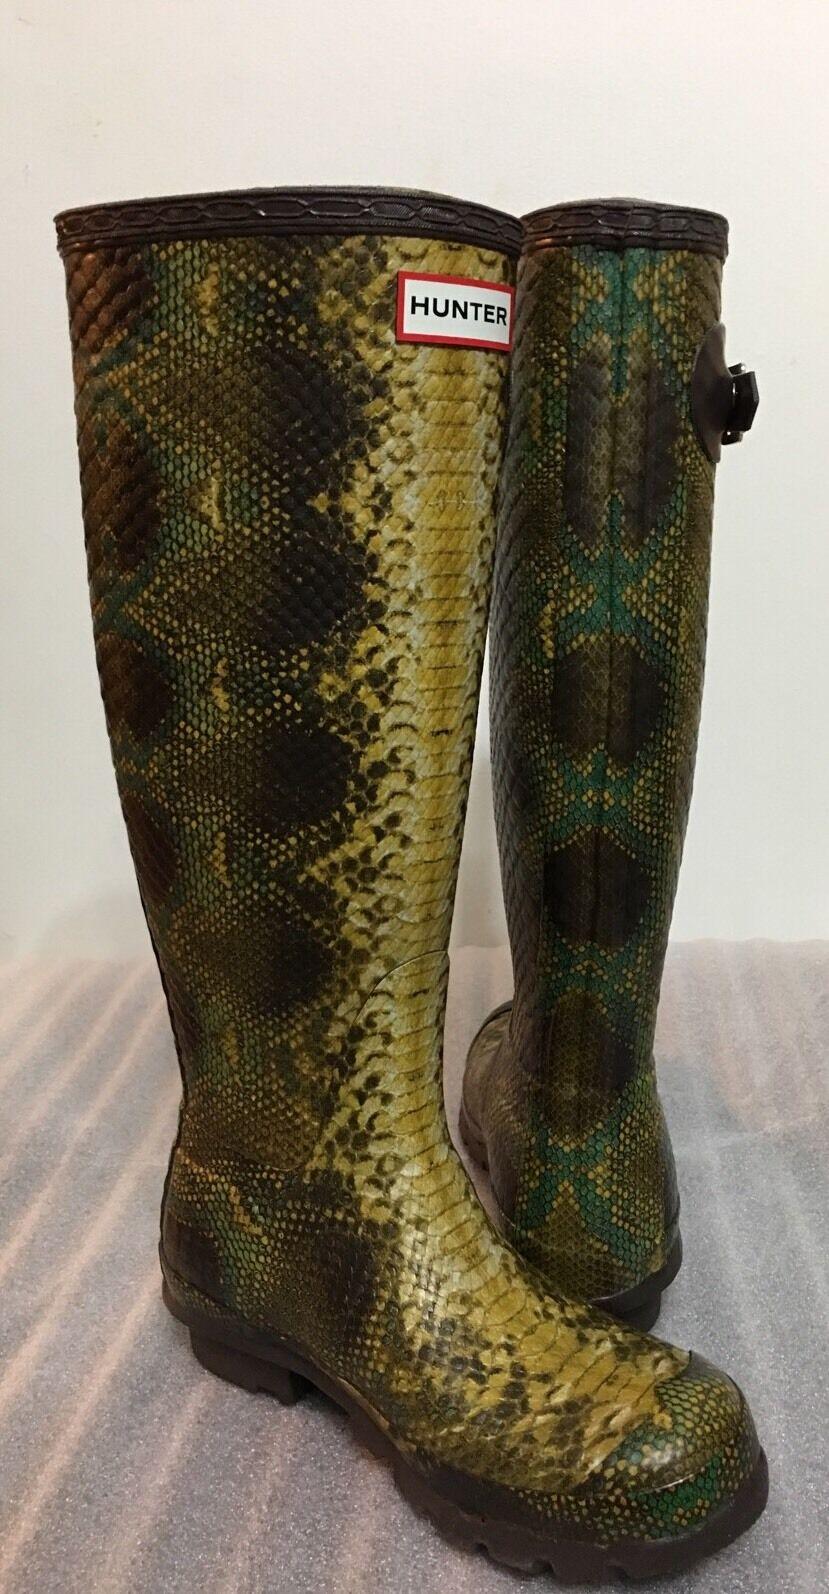 Hunter Limited Rare Carnaby Phyton Snakeskin Unisex Rain Boots Size 4M/5F